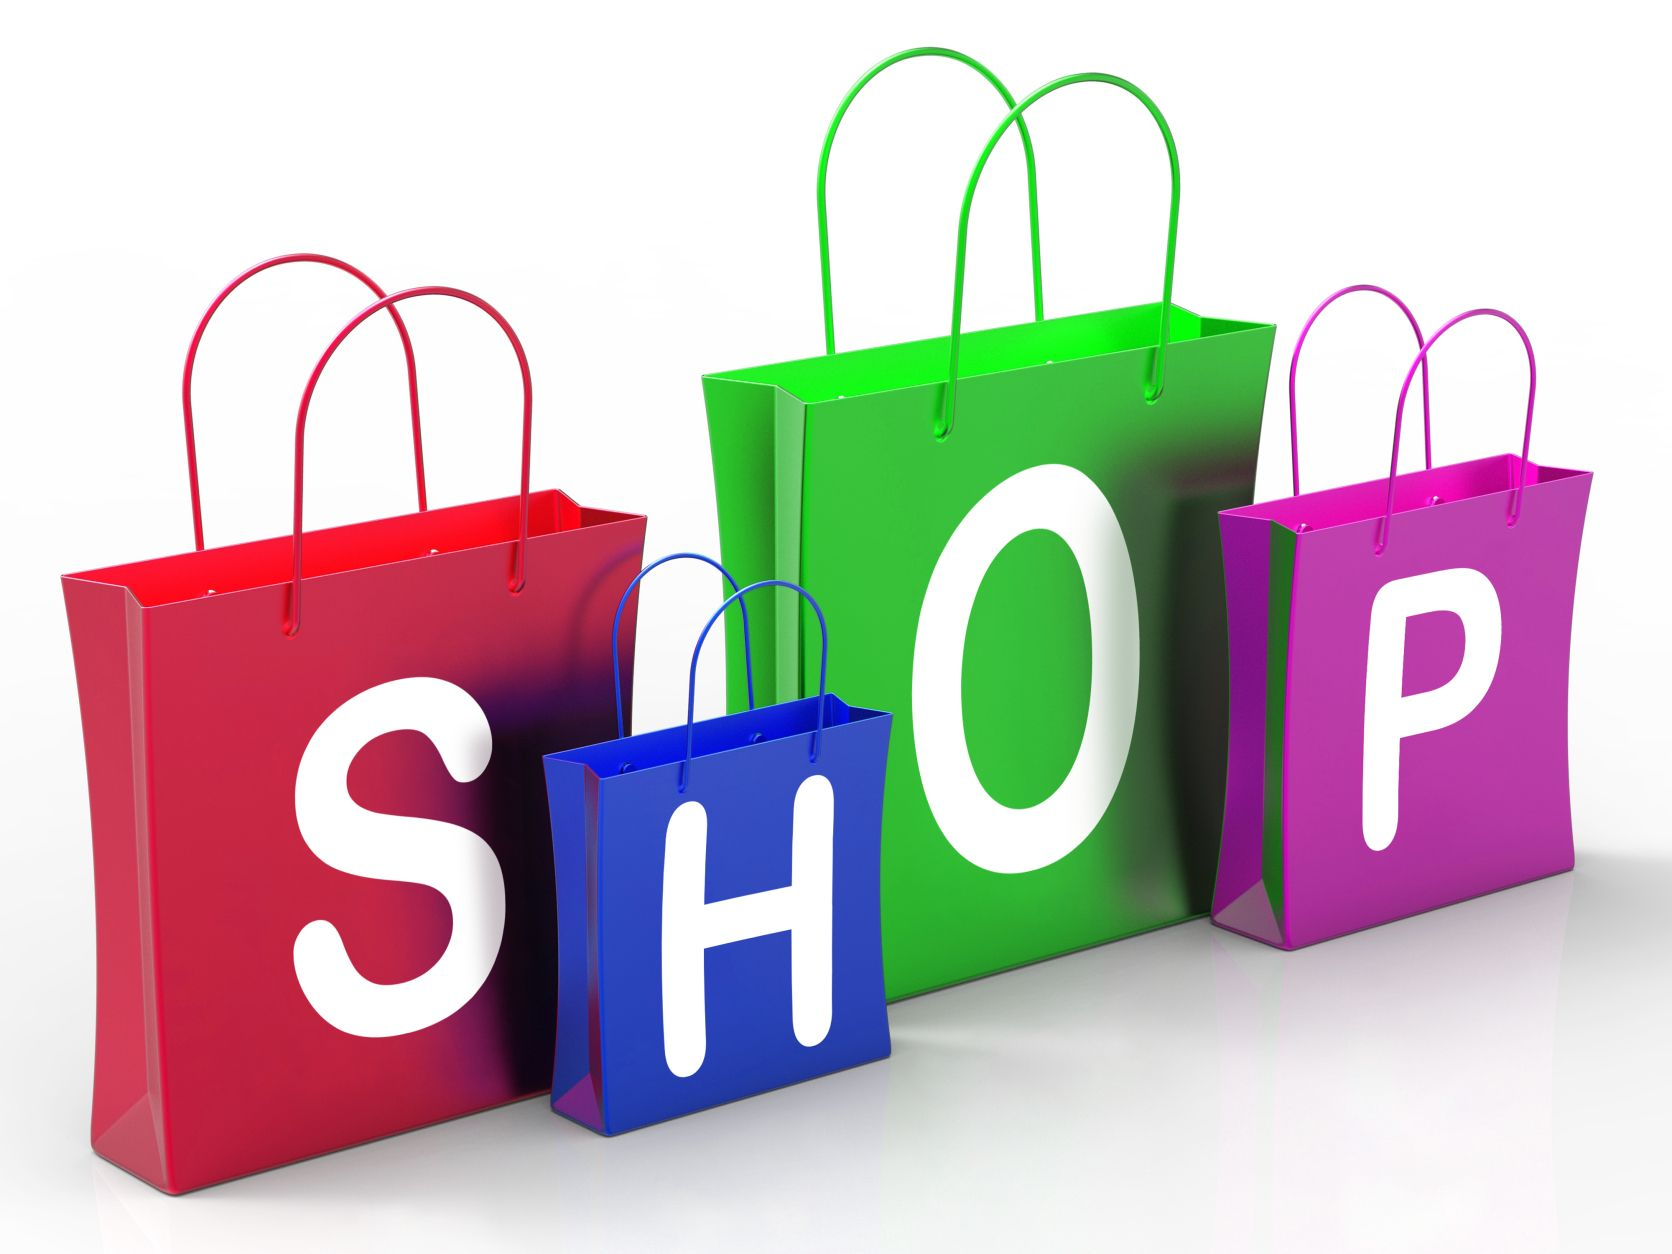 shopping images clip art wallpaper with hd desktop 1672x1254 px rh pinterest co uk shopping mall clipart free shopping trolley clipart free